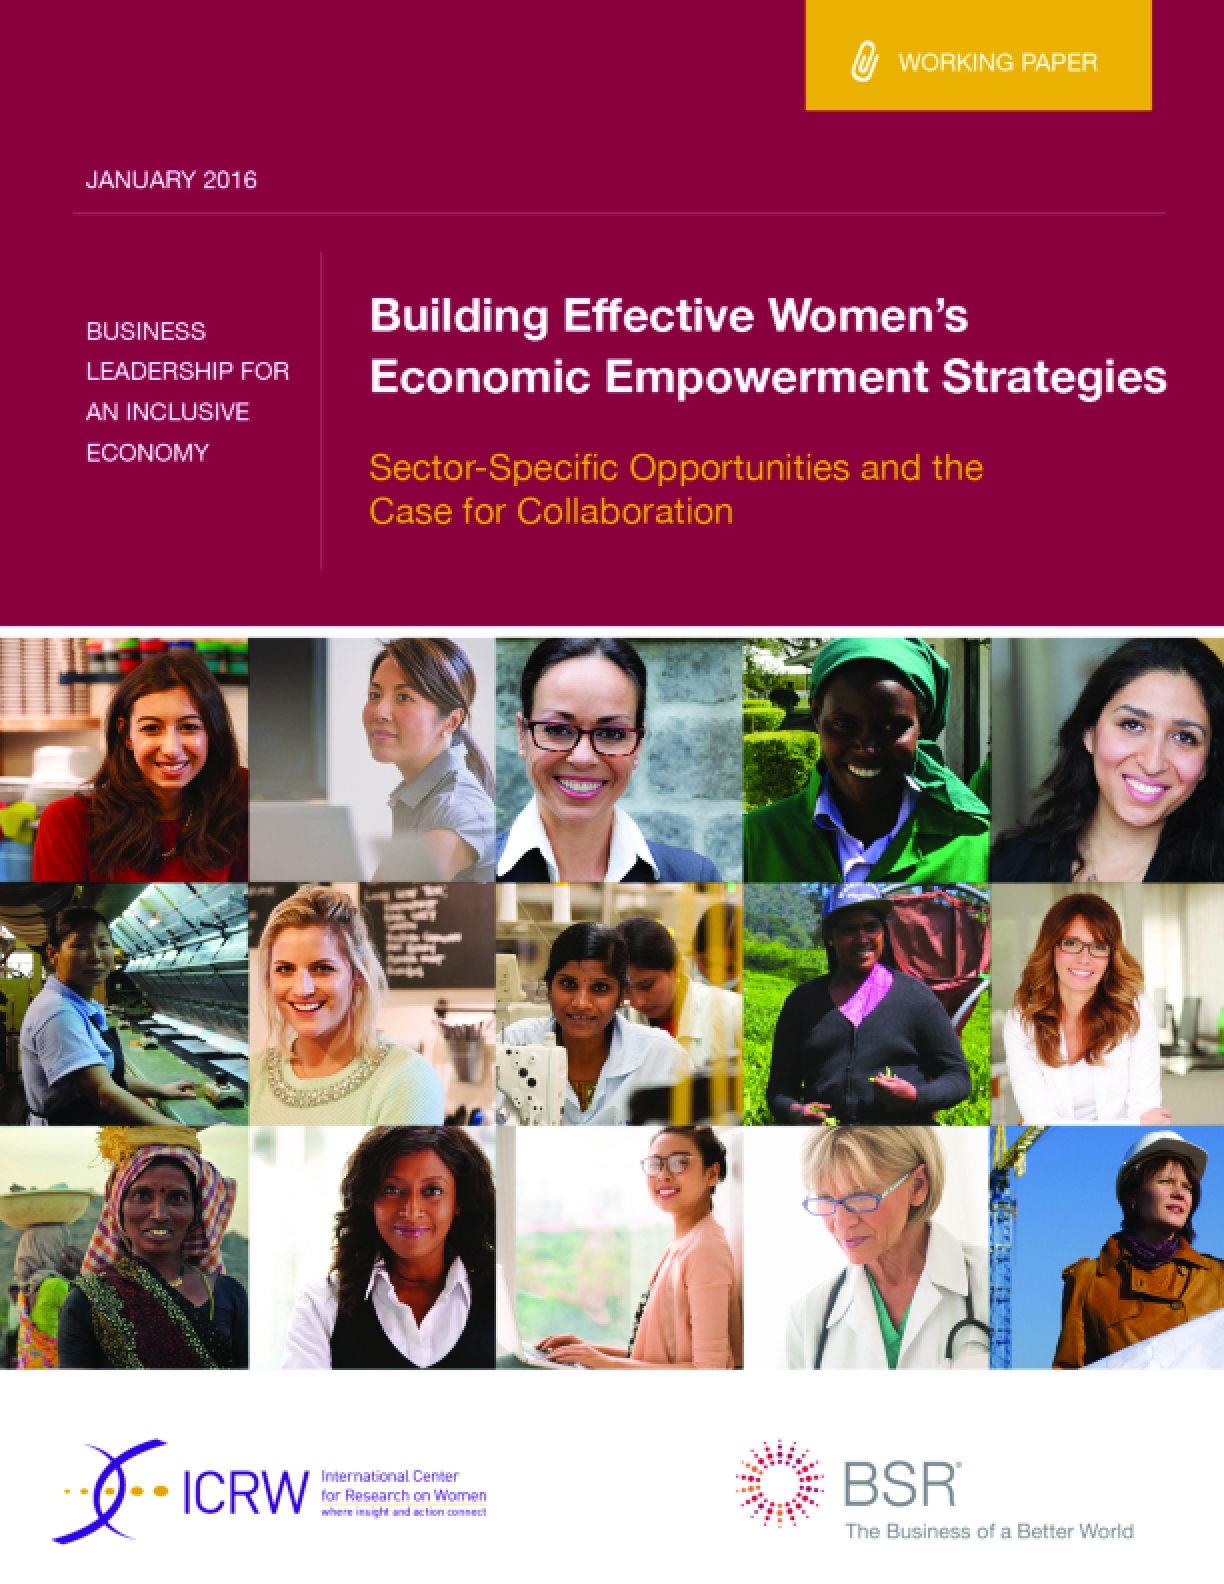 Building Effective Women's Economic Empowerment Strategies